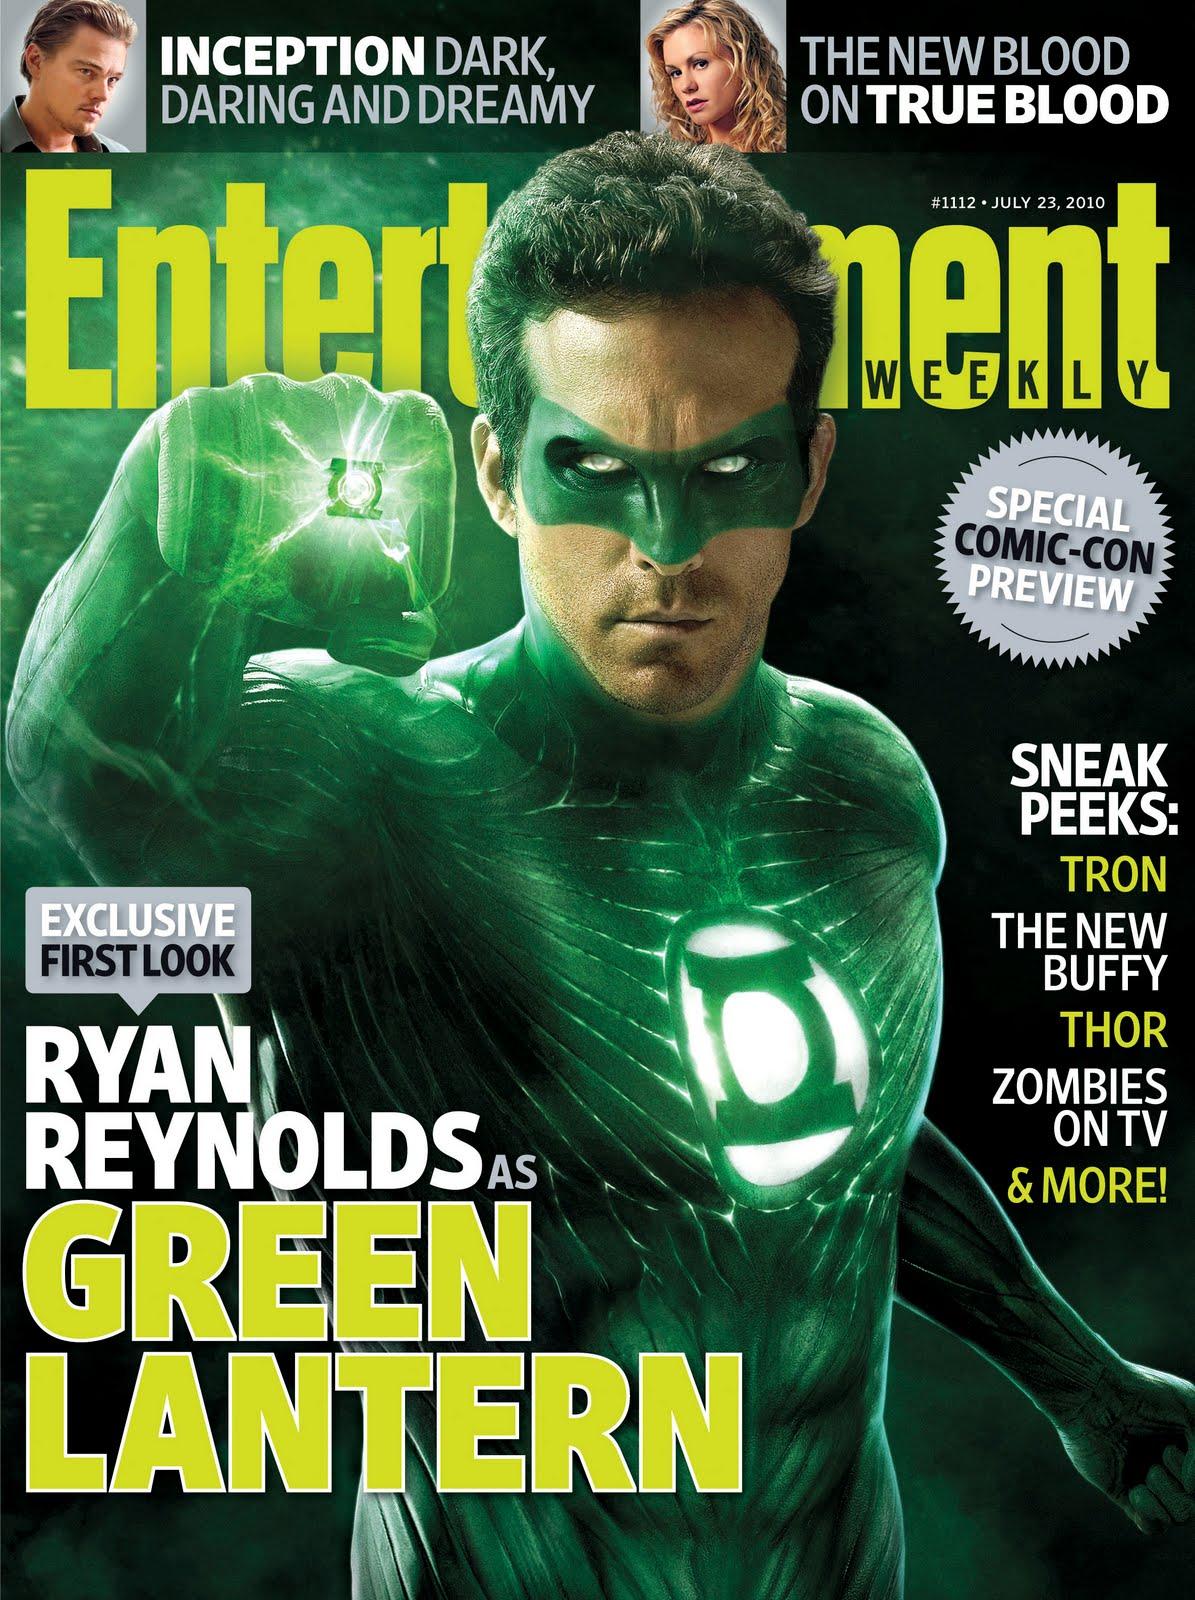 http://4.bp.blogspot.com/_eHkTwd4aRic/TI2VWzGpW_I/AAAAAAAAVLA/R_BUZoXqy8g/s1600/Green-Lantern-costume-Ryan-Reynolds.jpg